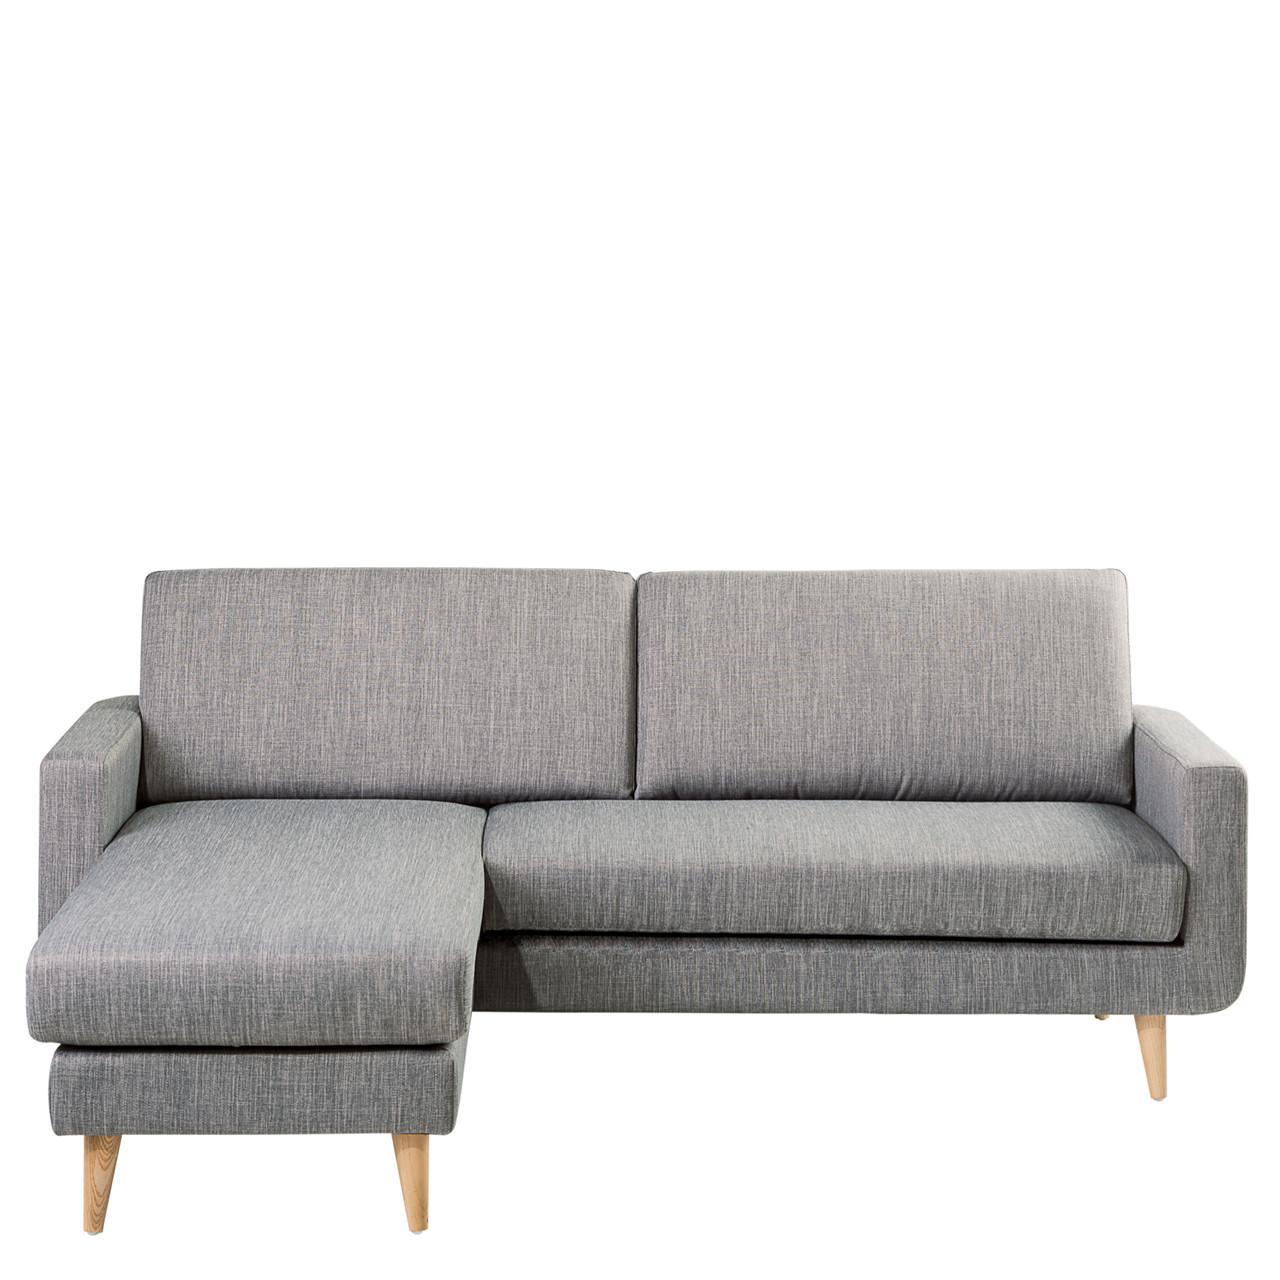 Chaiselong sofa » Køb smukke Chaiselong sofaer her